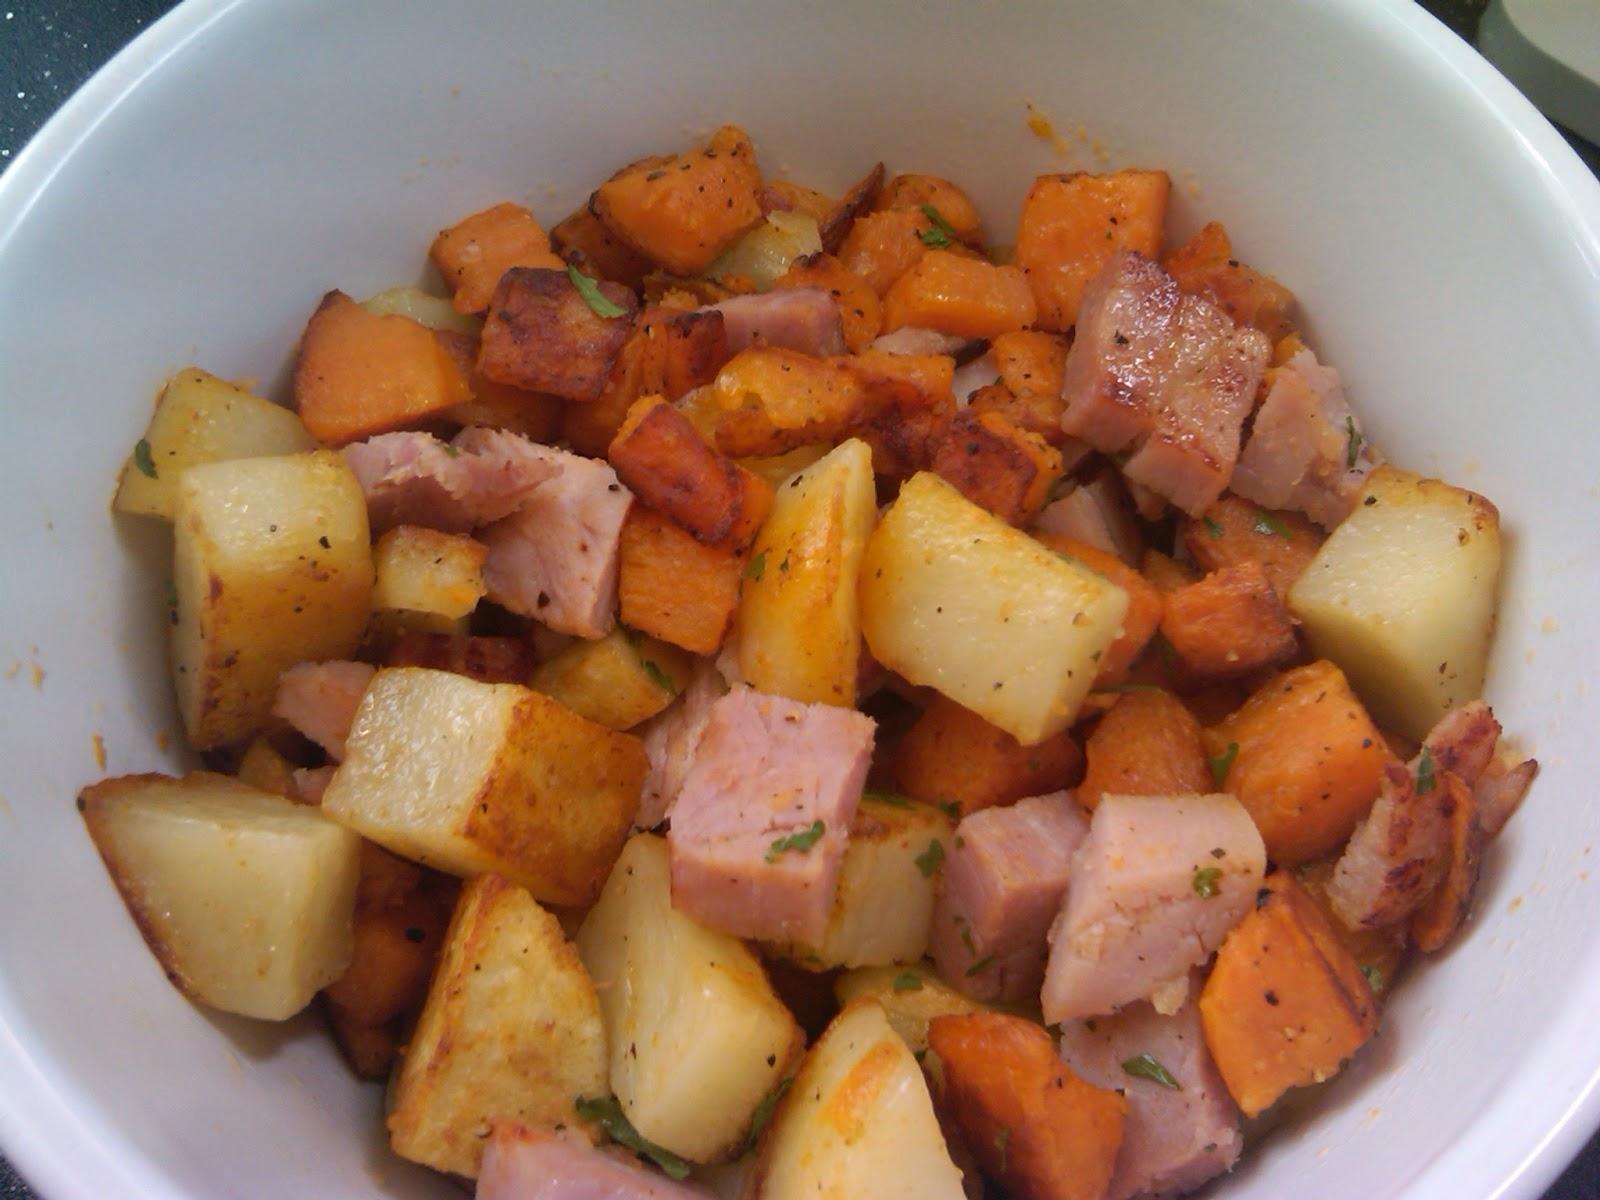 ham potatoes hash 1 sweet potato peeled and cubed 2